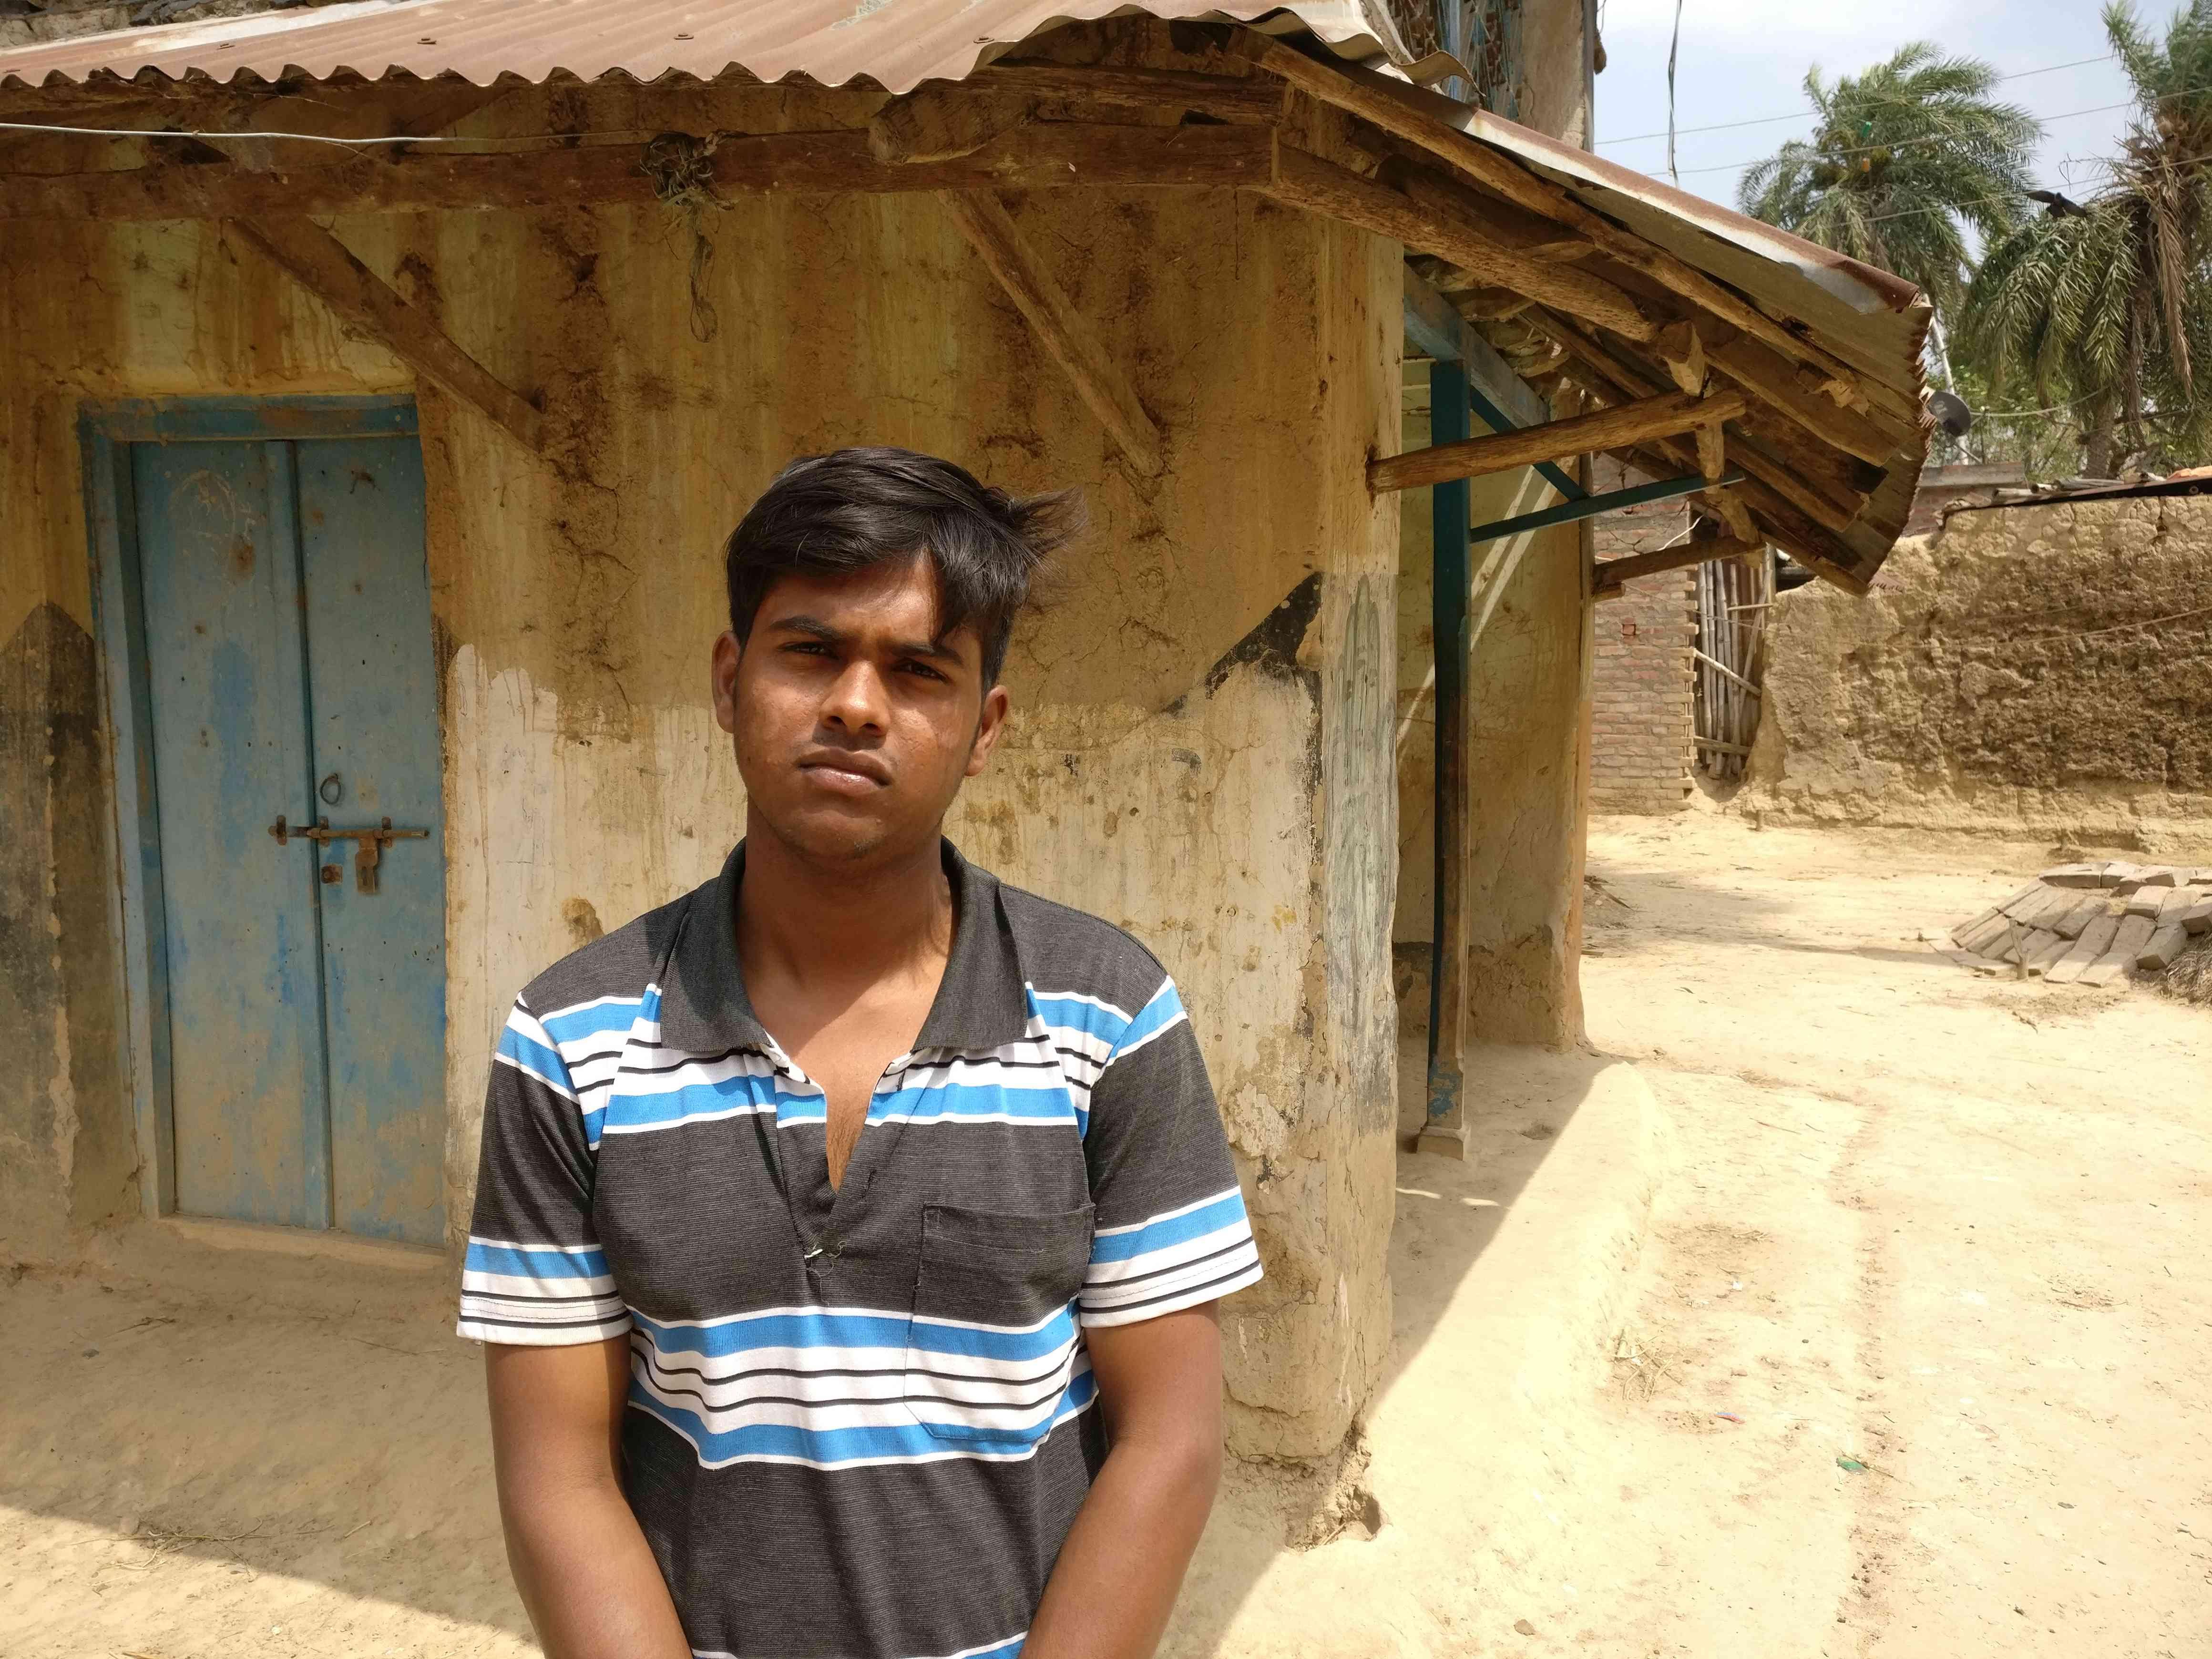 Golam Mustafa is unhappy with the Congress for not doing development work in his in Bahalnagar village, Murshidabad. Photo credit: Shoaib Daniyal